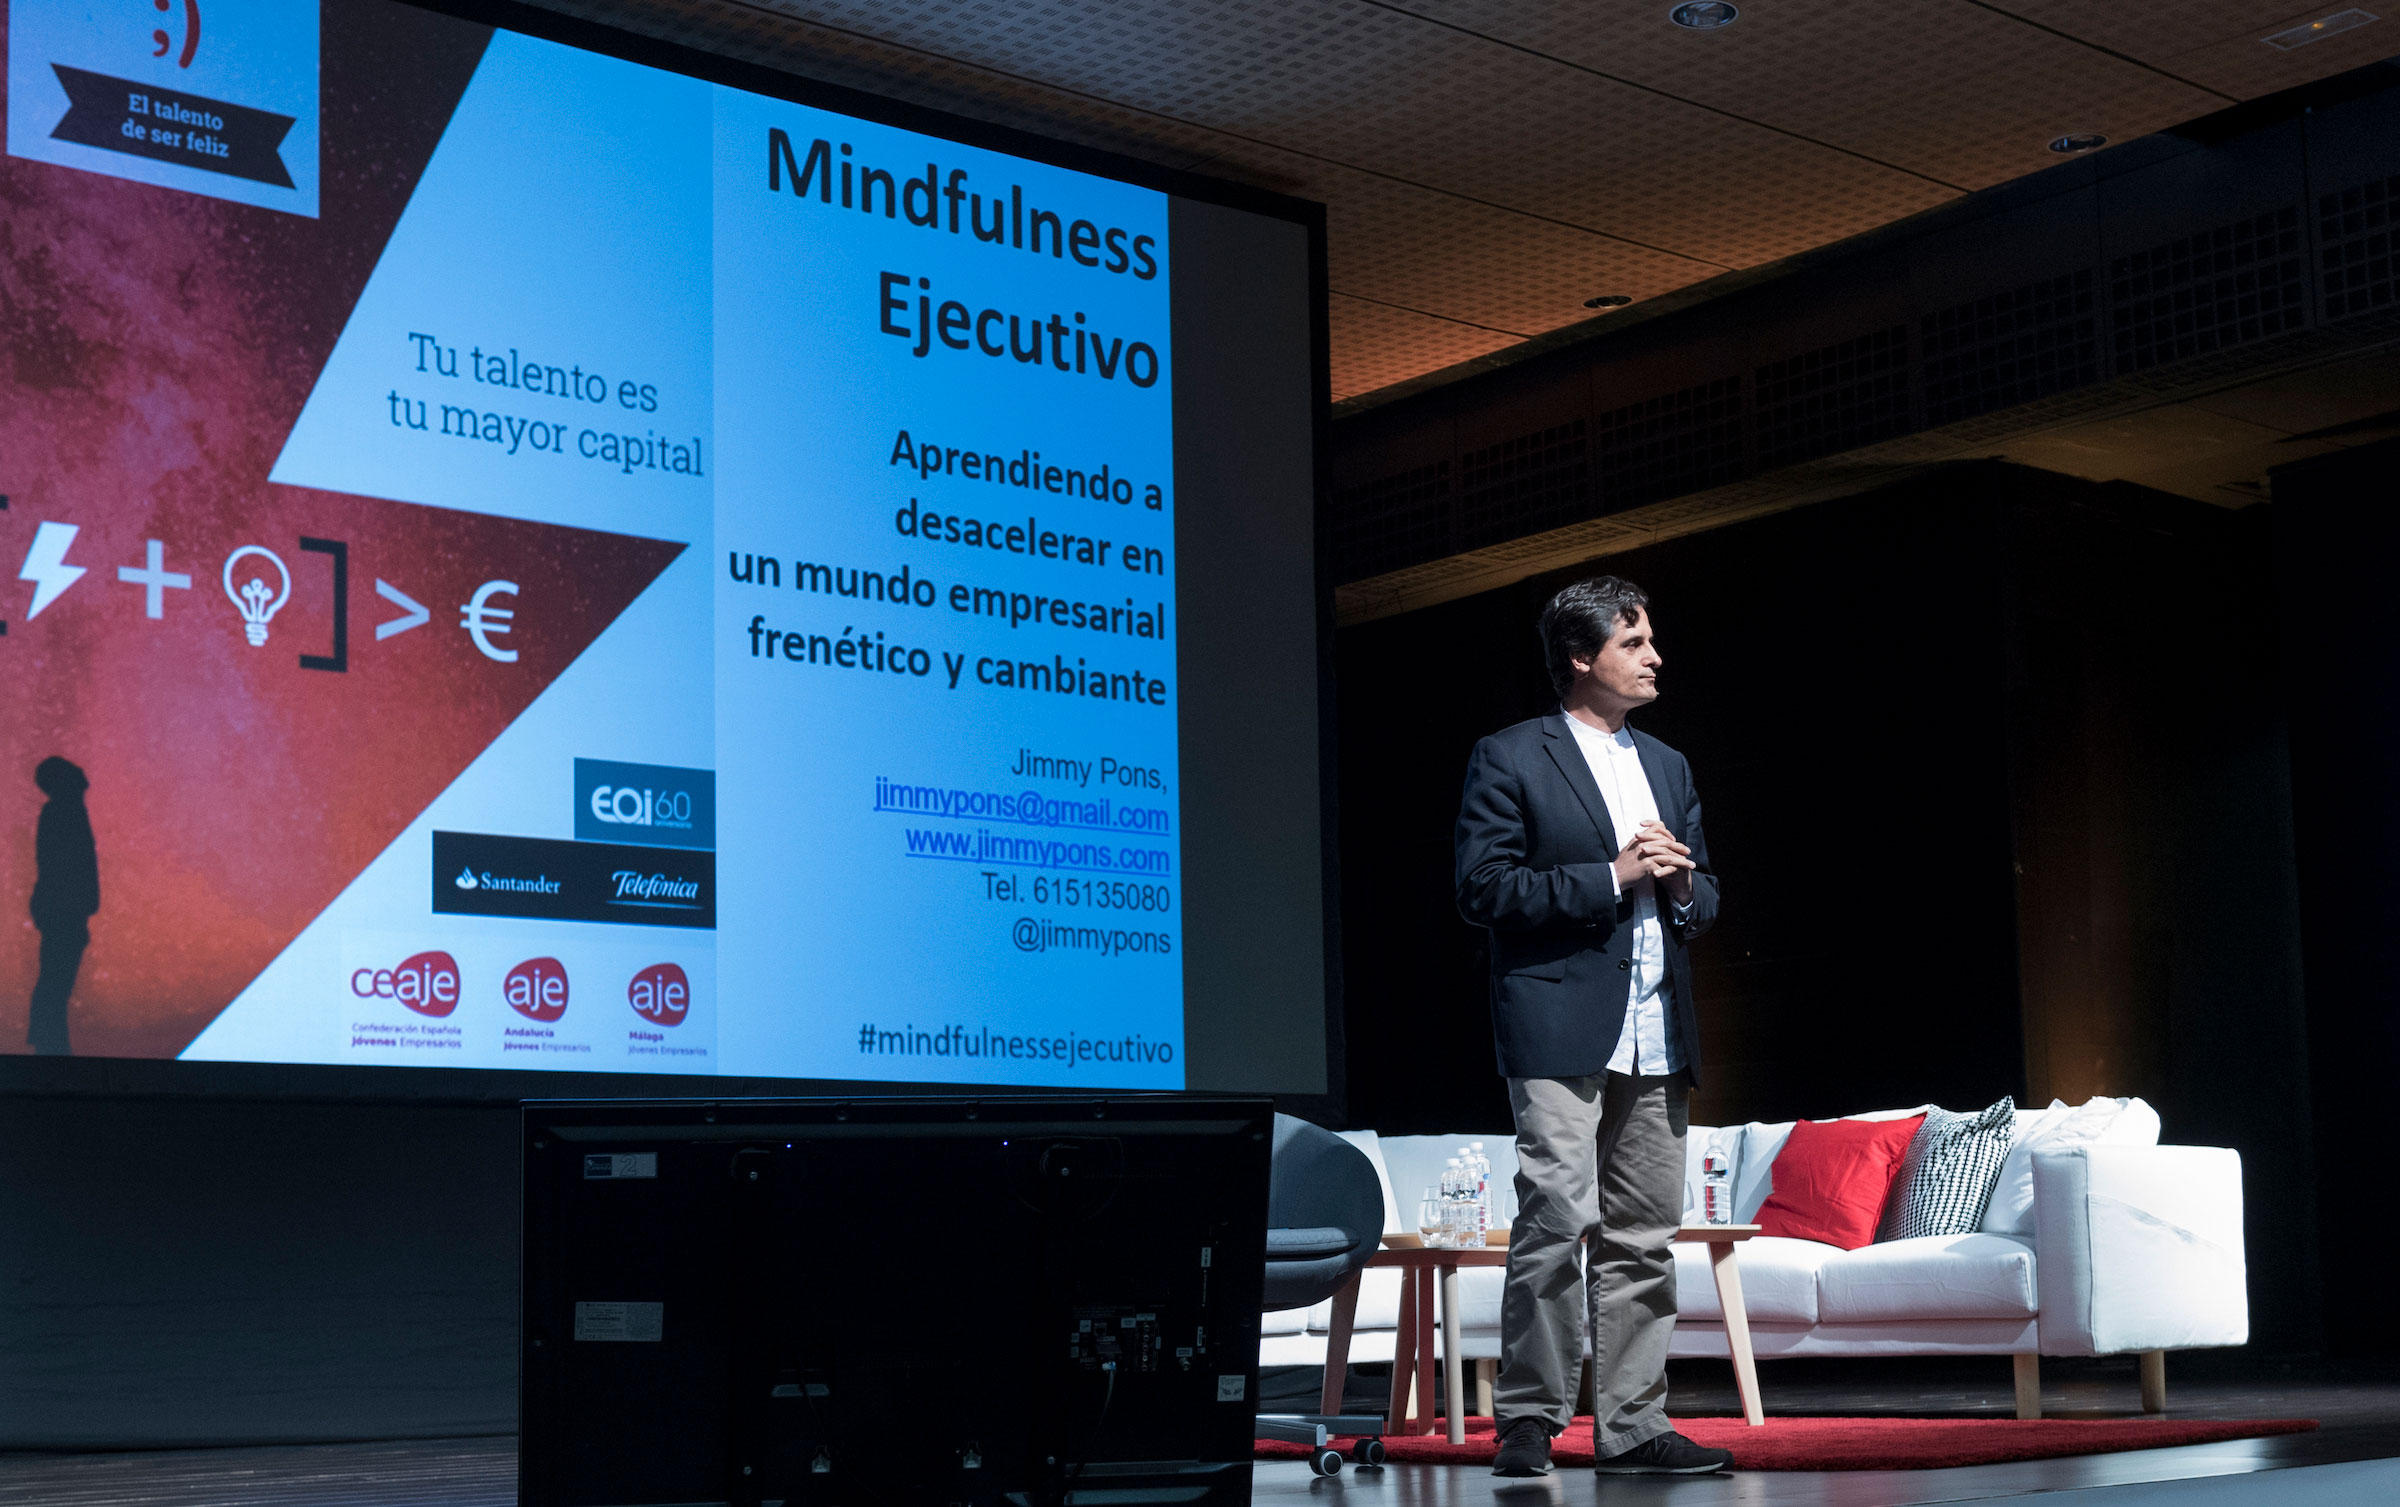 Jimmy Pons Mindfulness Ejecutivo